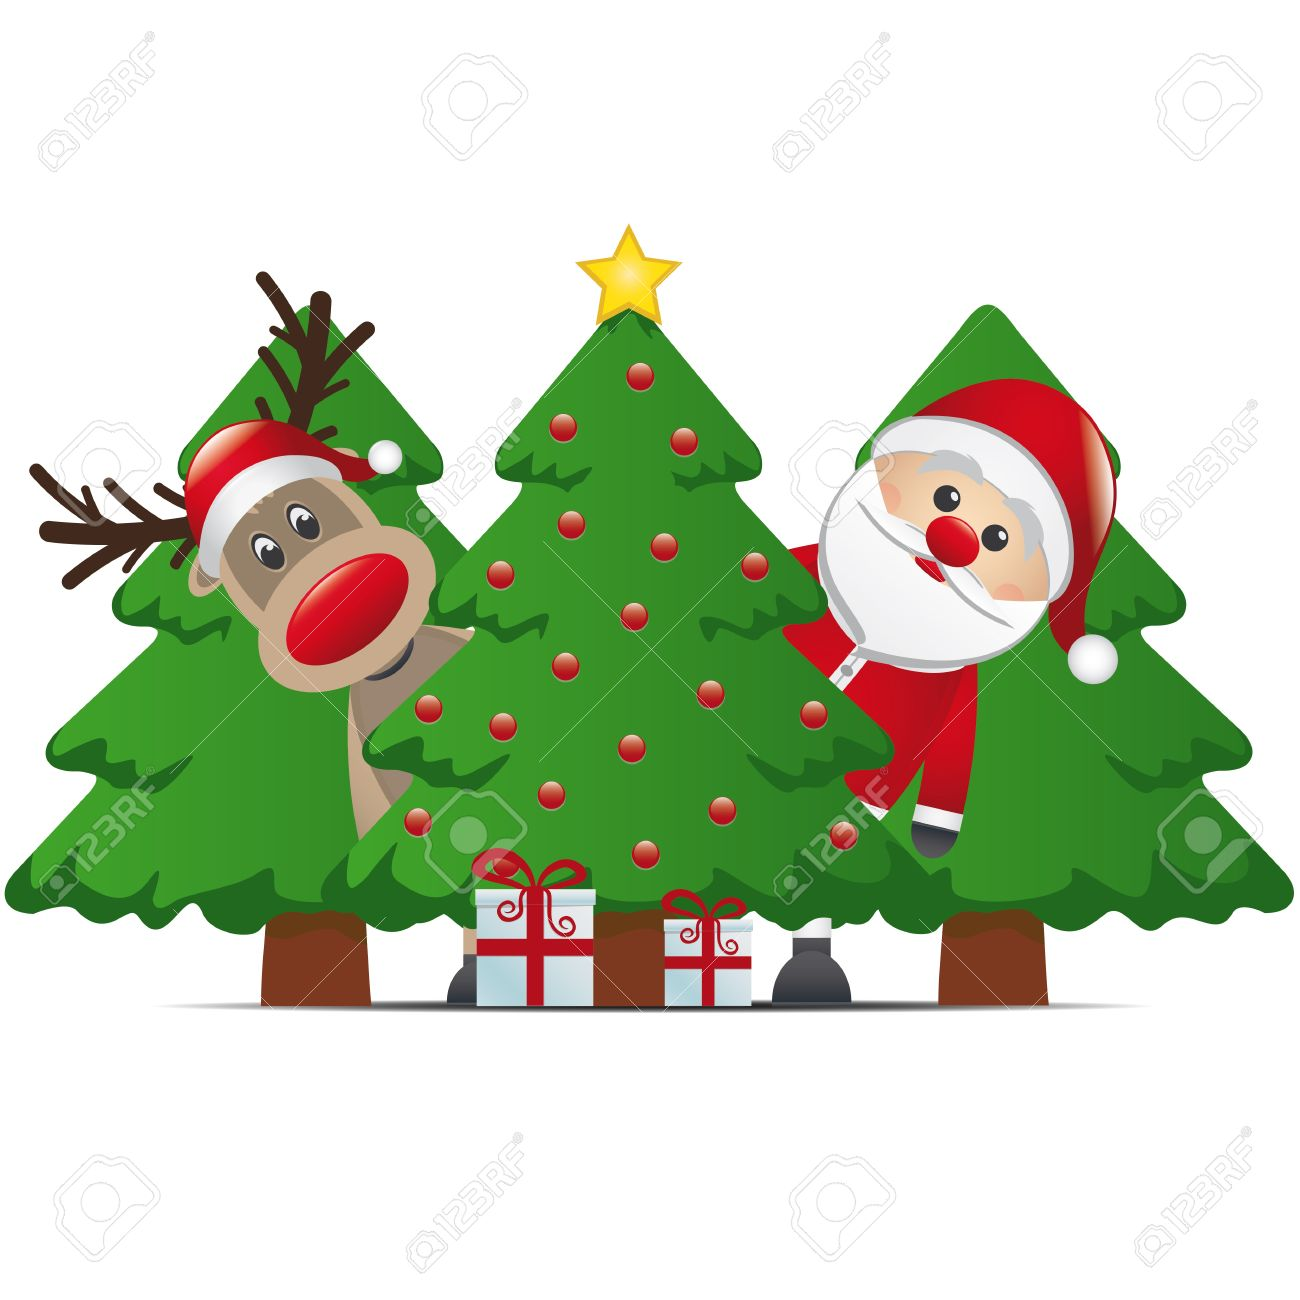 reindeer santa claus christmas tree gift box Stock Vector - 15816117